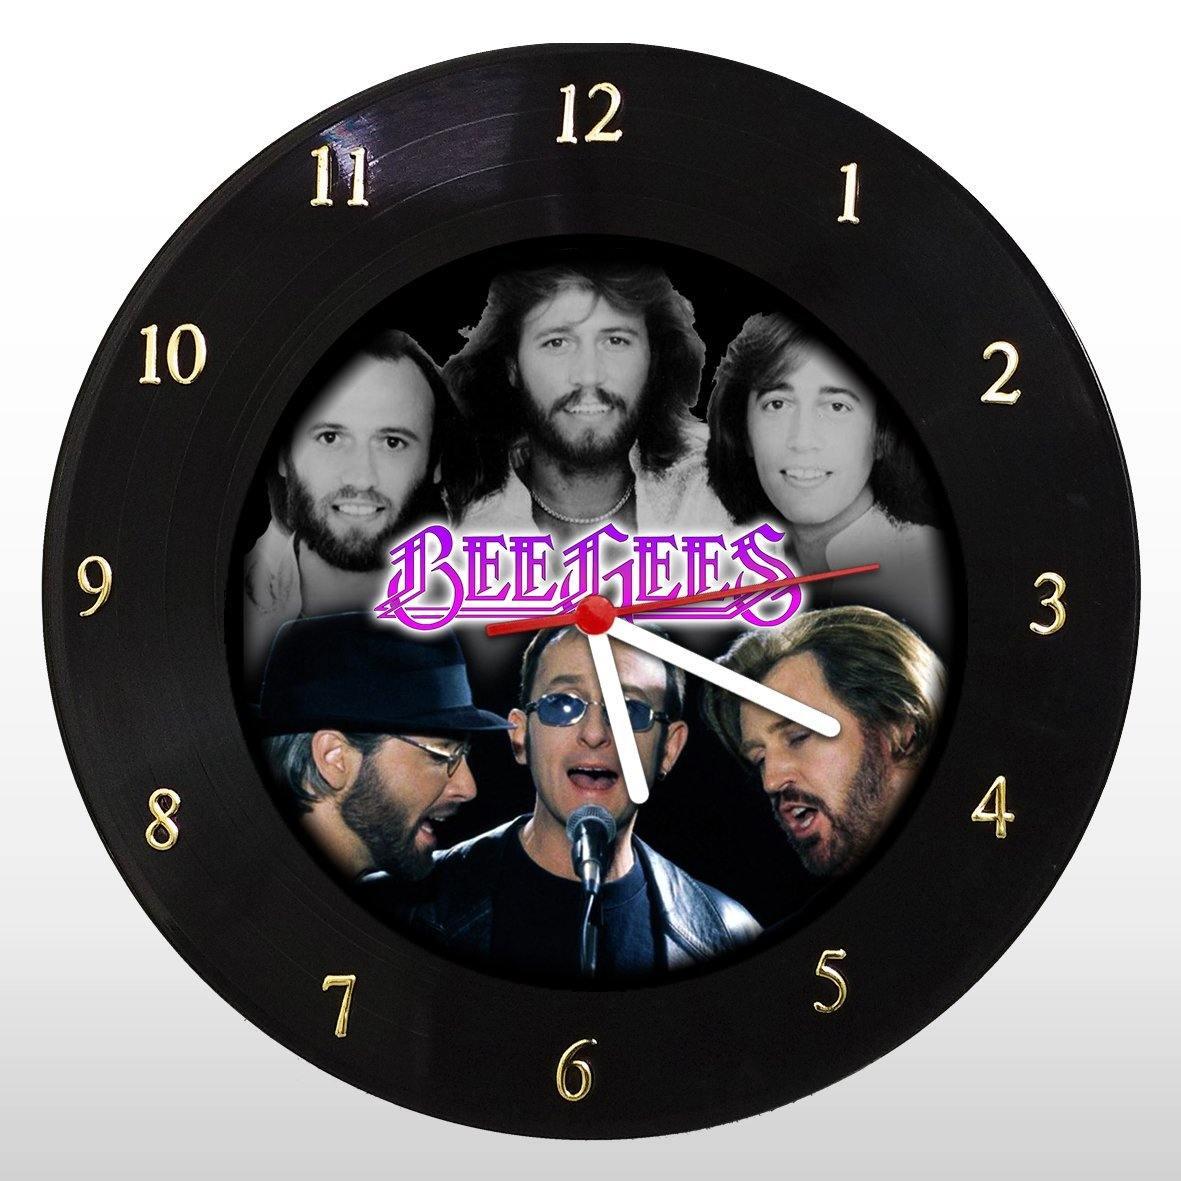 Bee Gees - Relógio de Parede em Disco de Vinil - Mr. Rock